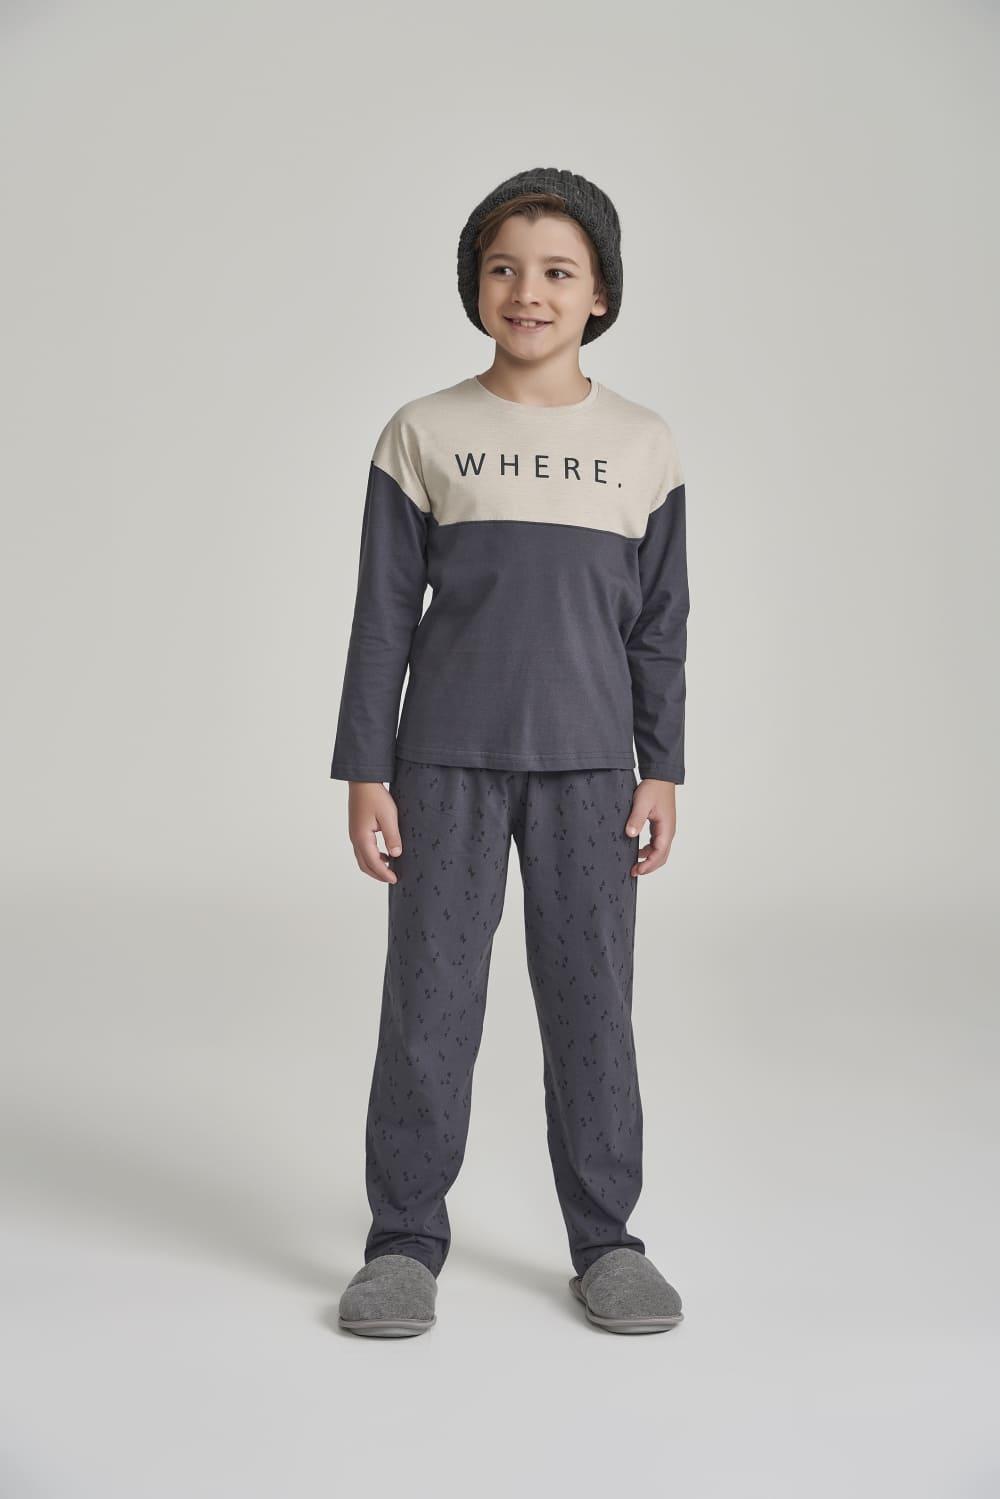 Pijama Manga Longa Infantil Where